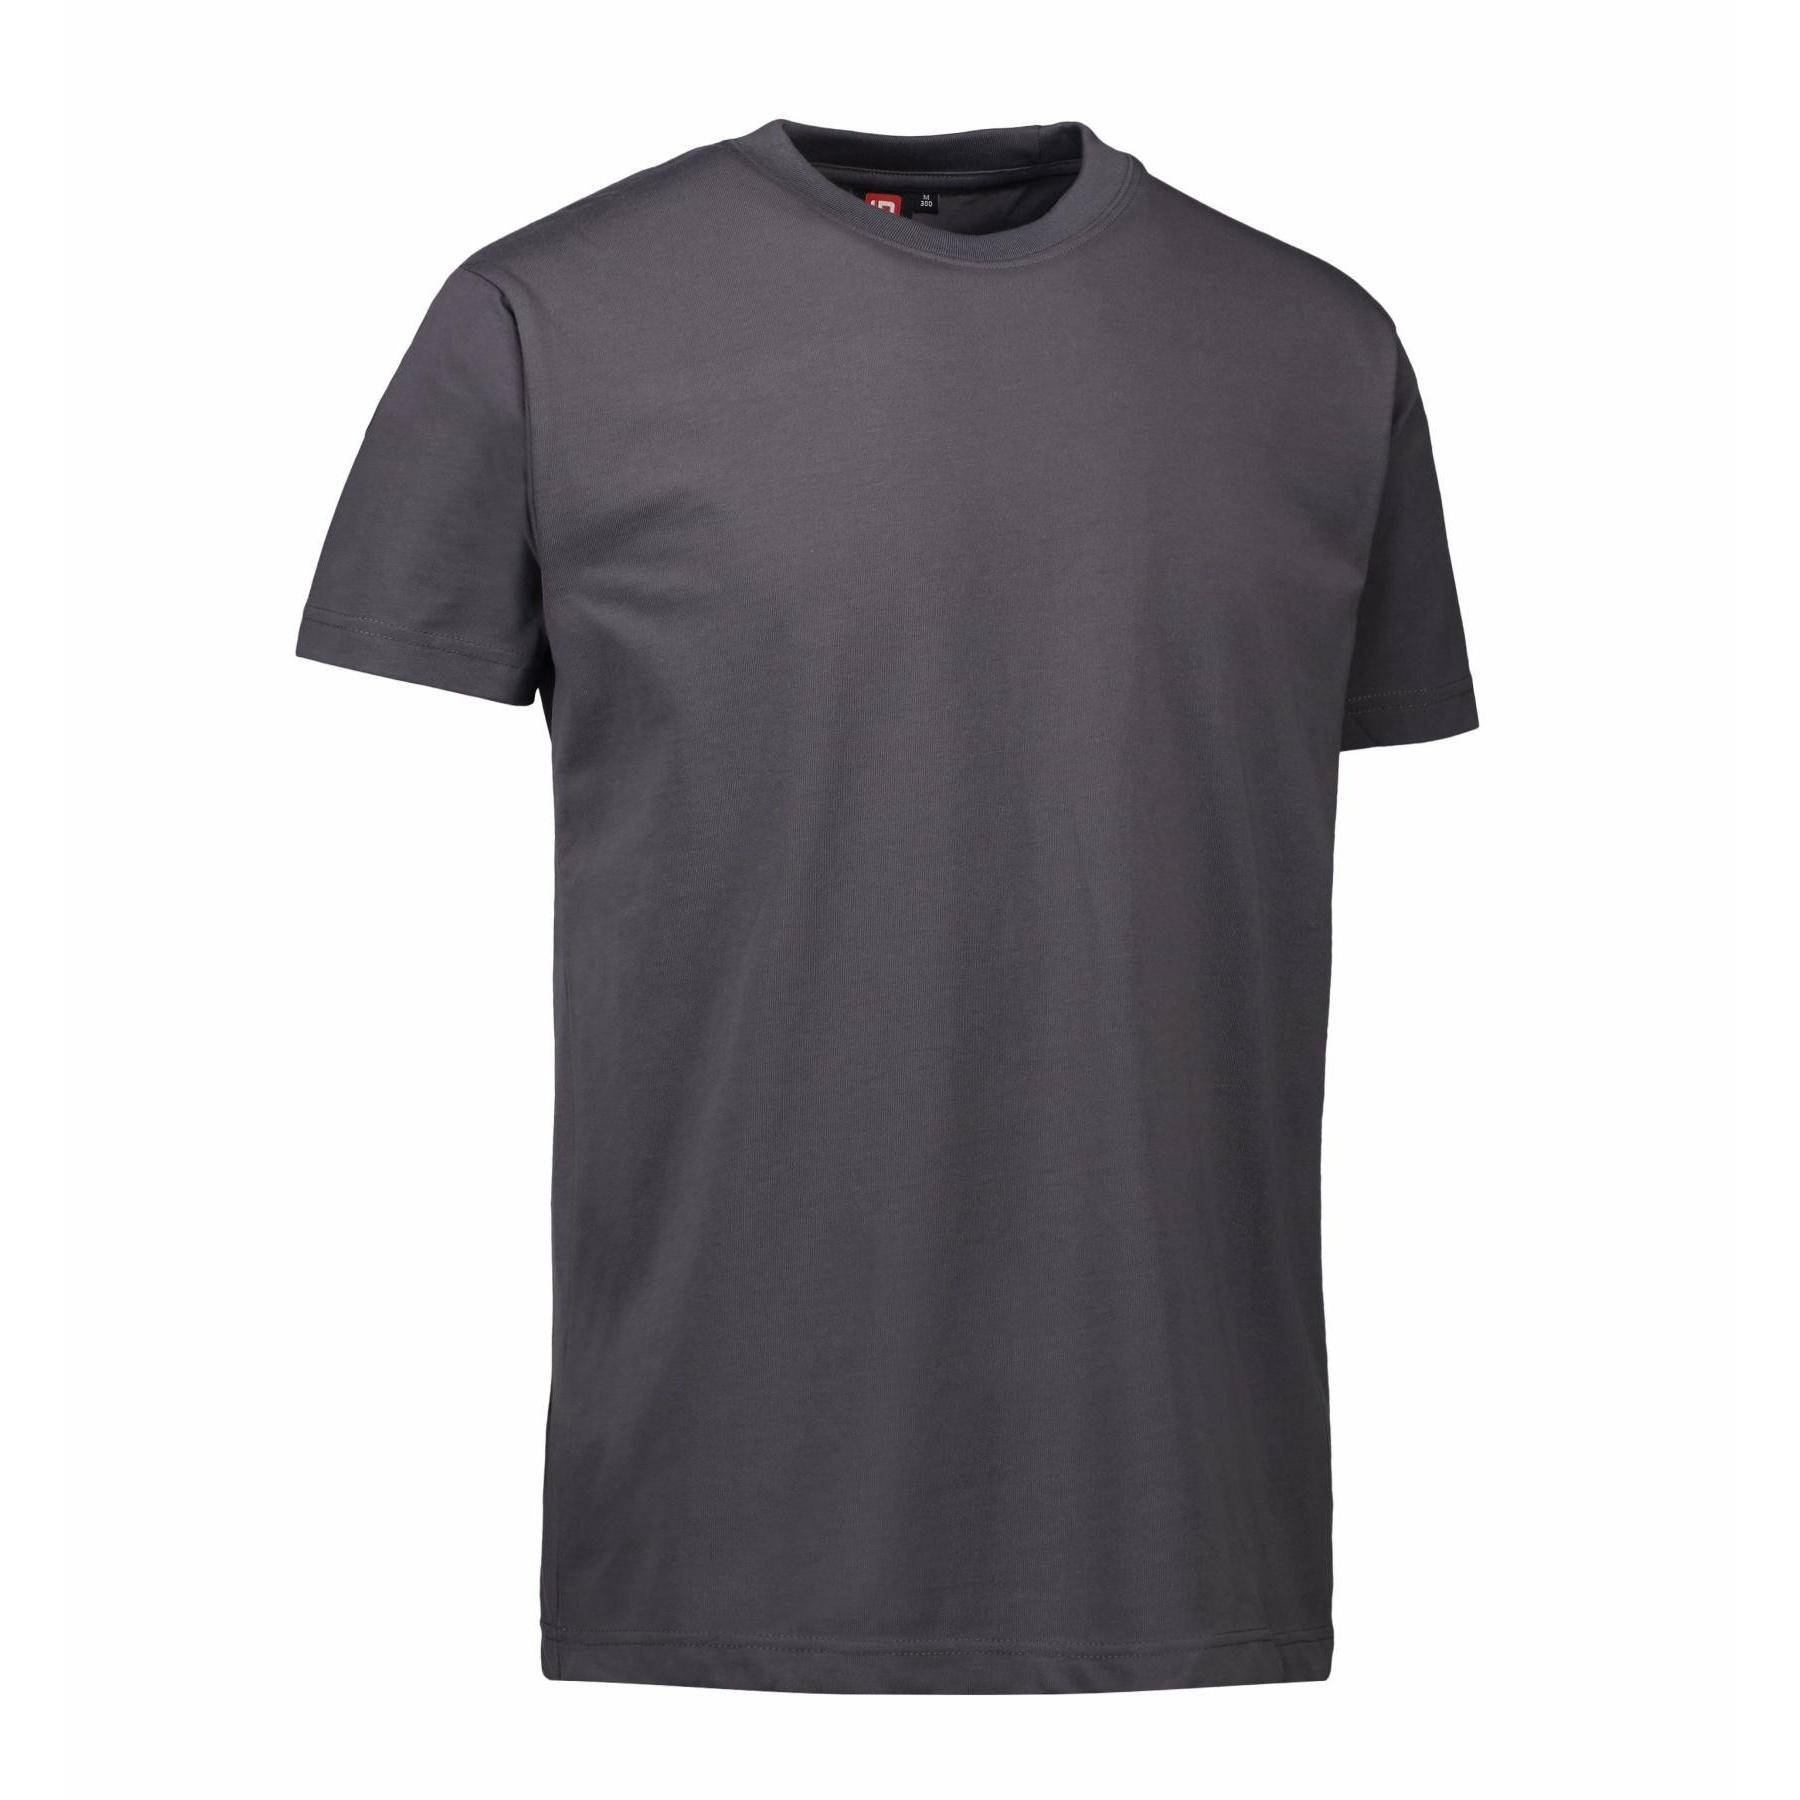 ID-Mens-Pro-Wear-Regular-Fitting-Short-Sleeve-T-Shirt-ID162